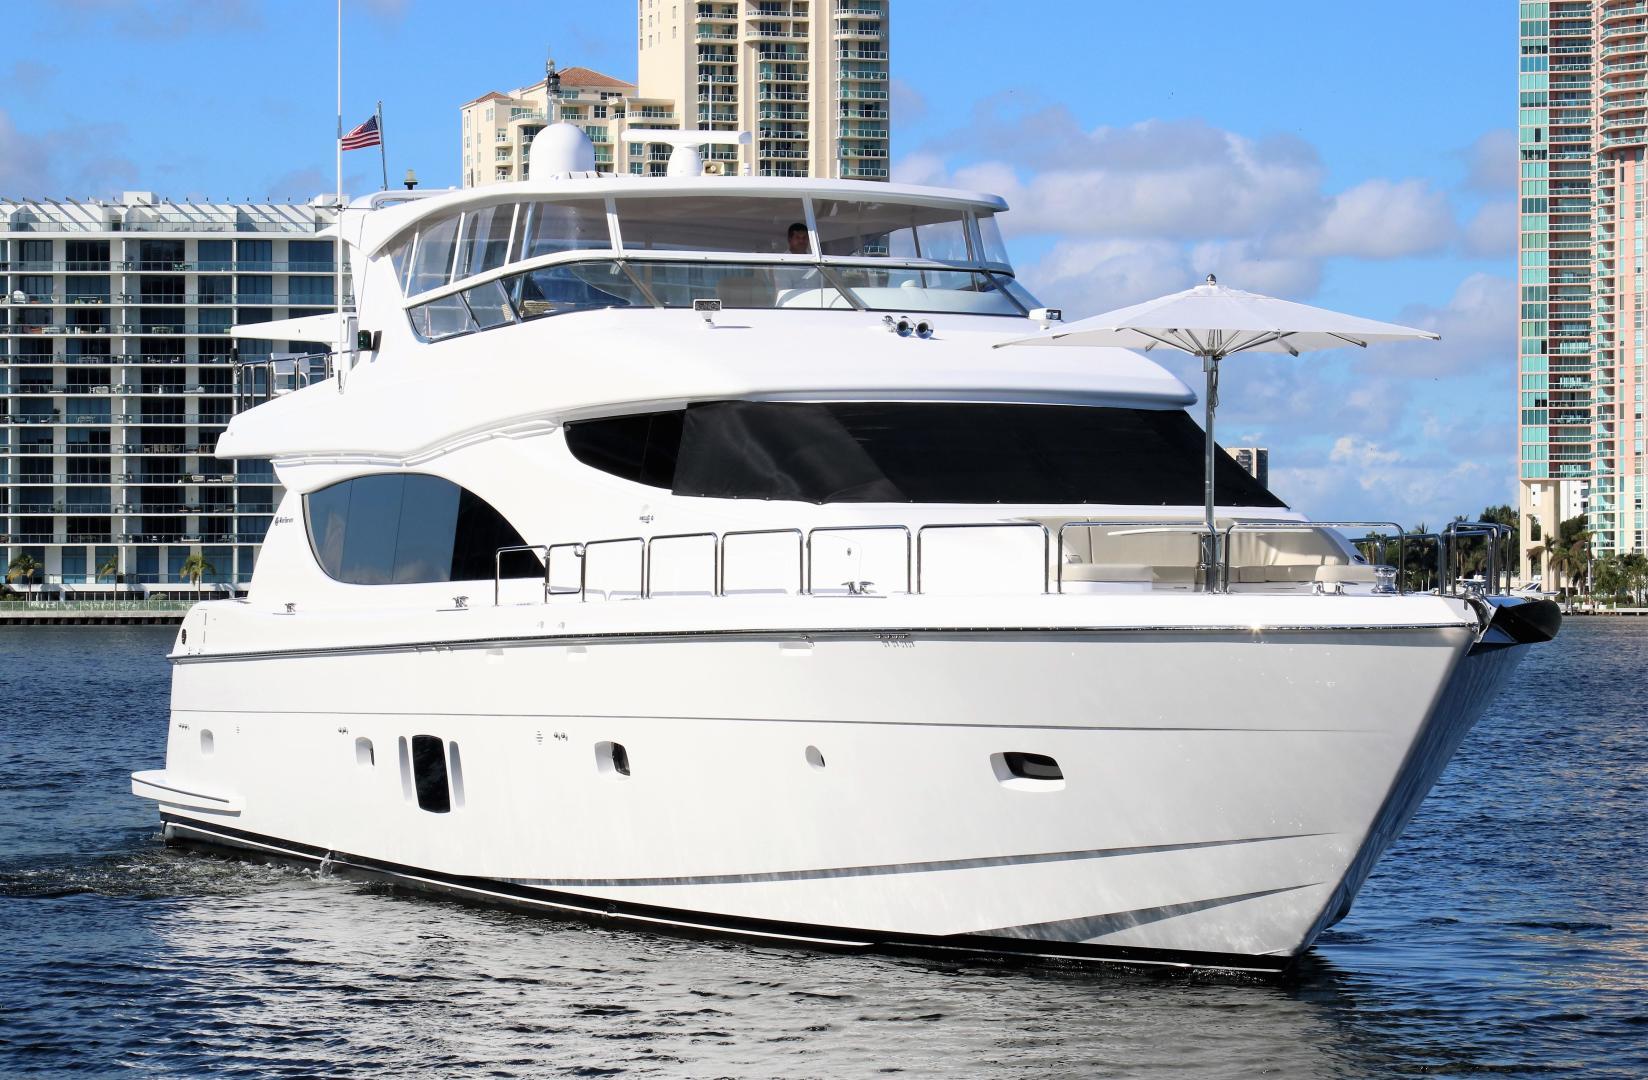 Hatteras-80 Motor Yacht 2015-Daddy Miami-Florida-United States-556318 | Thumbnail